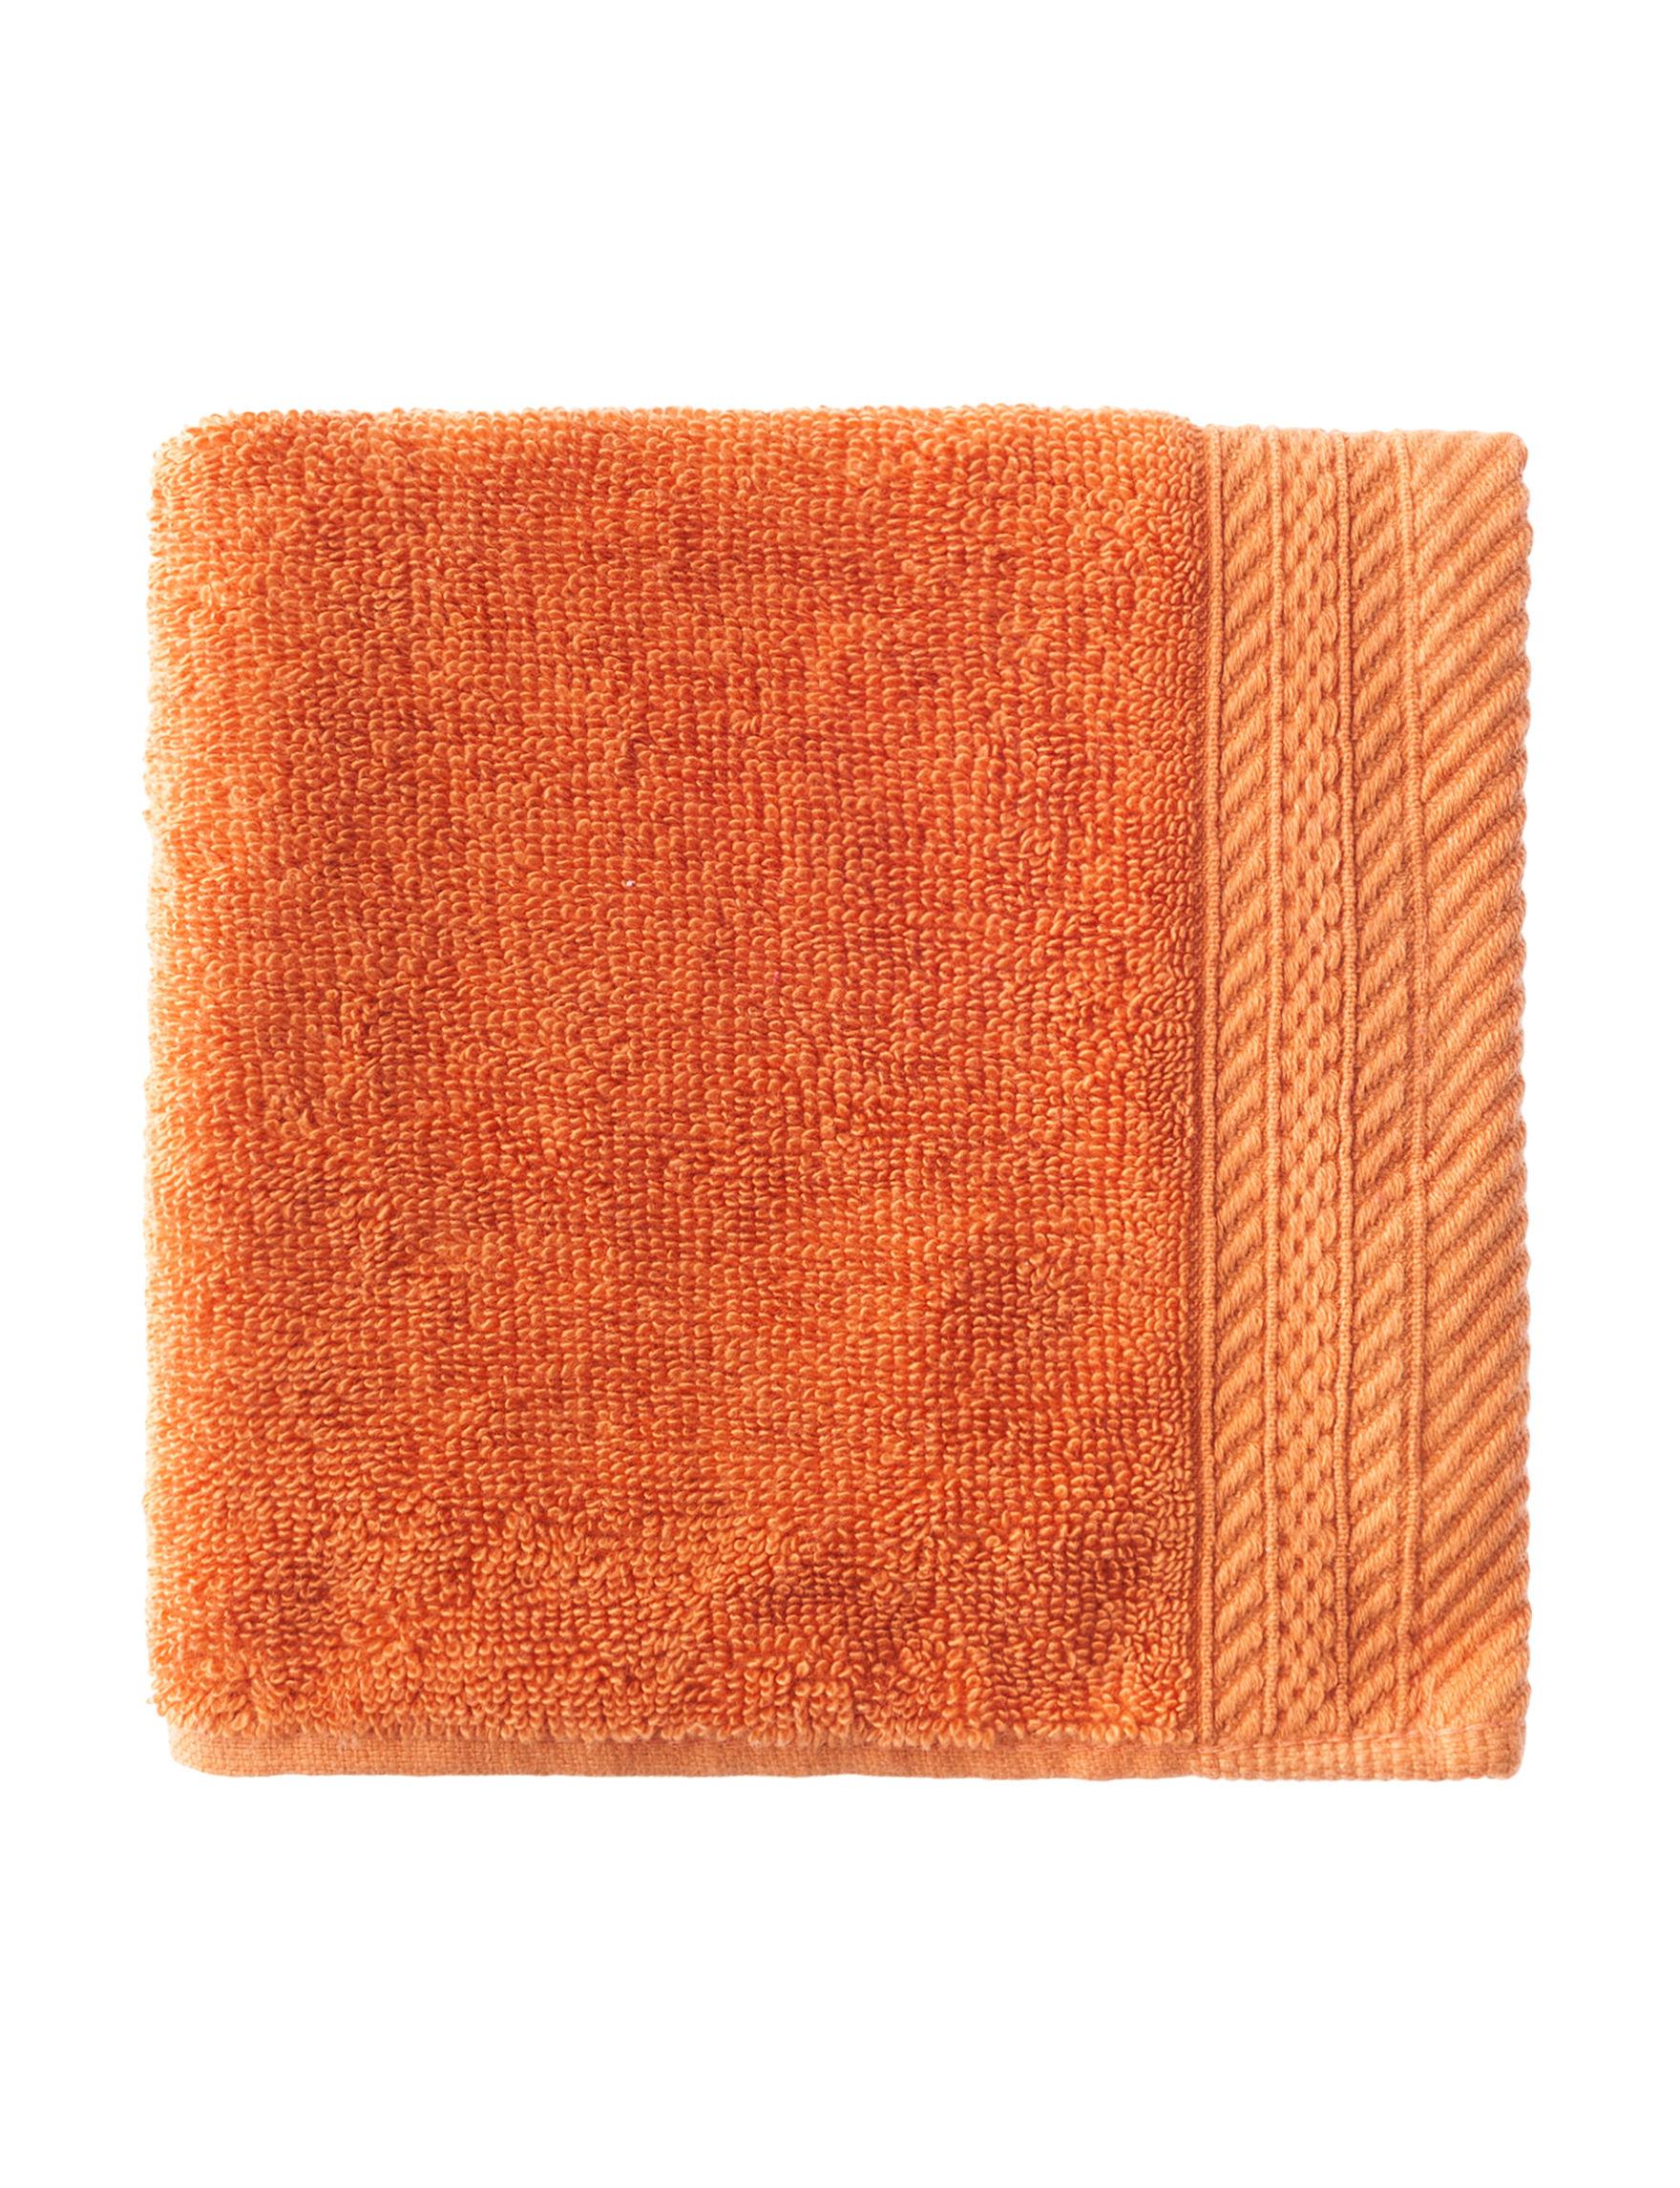 Apricot Washcloths Towels